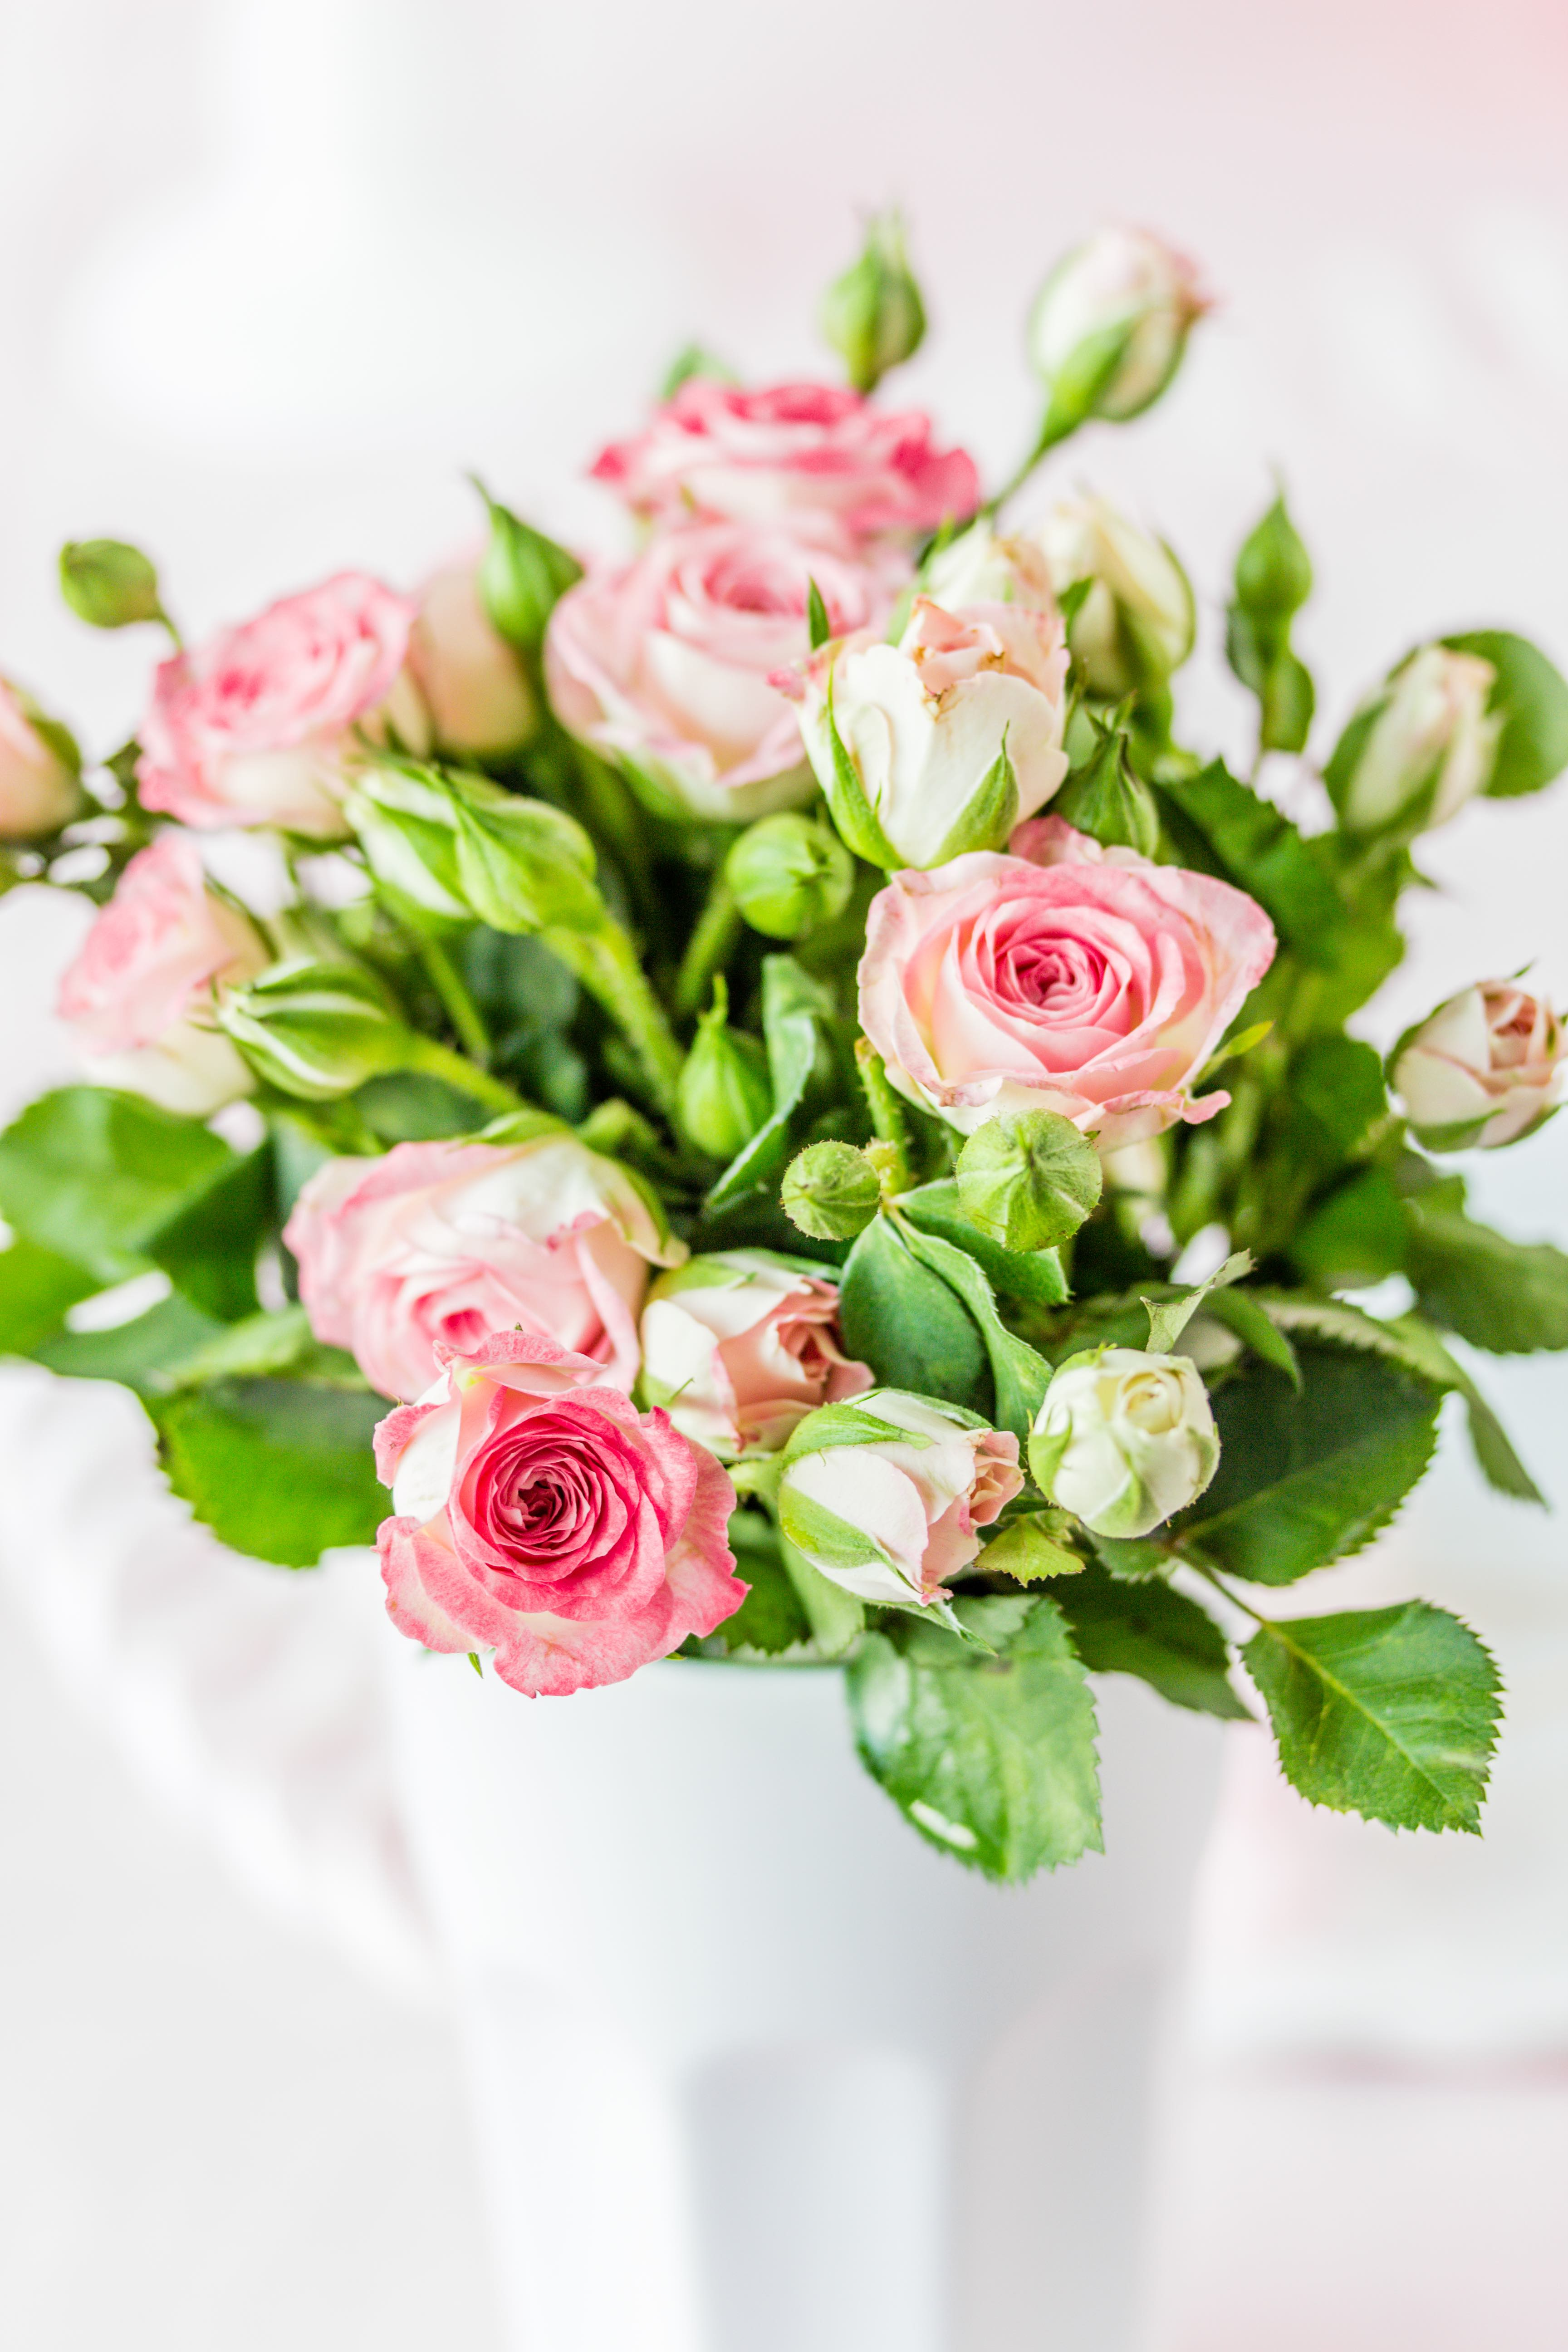 Rosa Mädchen Torte Rezept Geburtstag backen Drip Cake Ballerina #Torte #backen #dripcake #ballerina #cake | Emma´s Lieblingsstücke